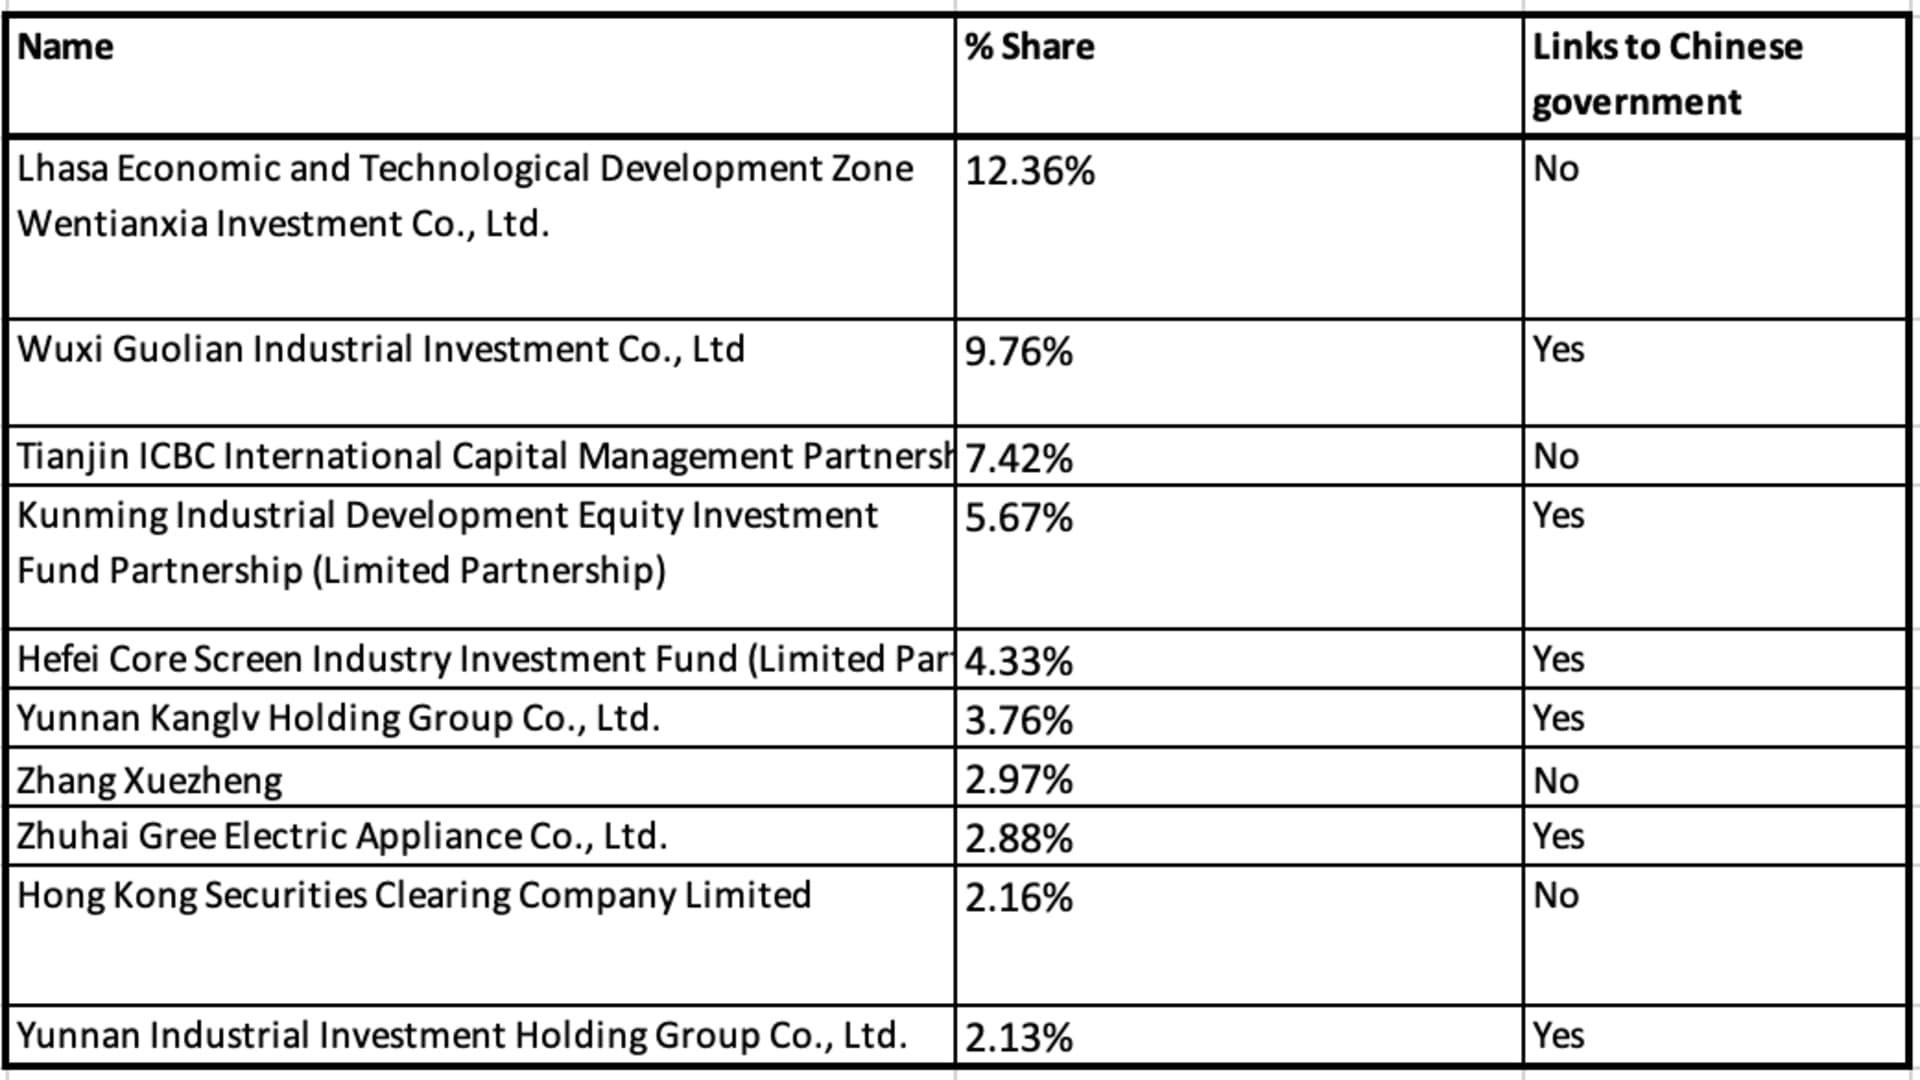 Datenna analysis of Wingtech's 10 largest shareholders.